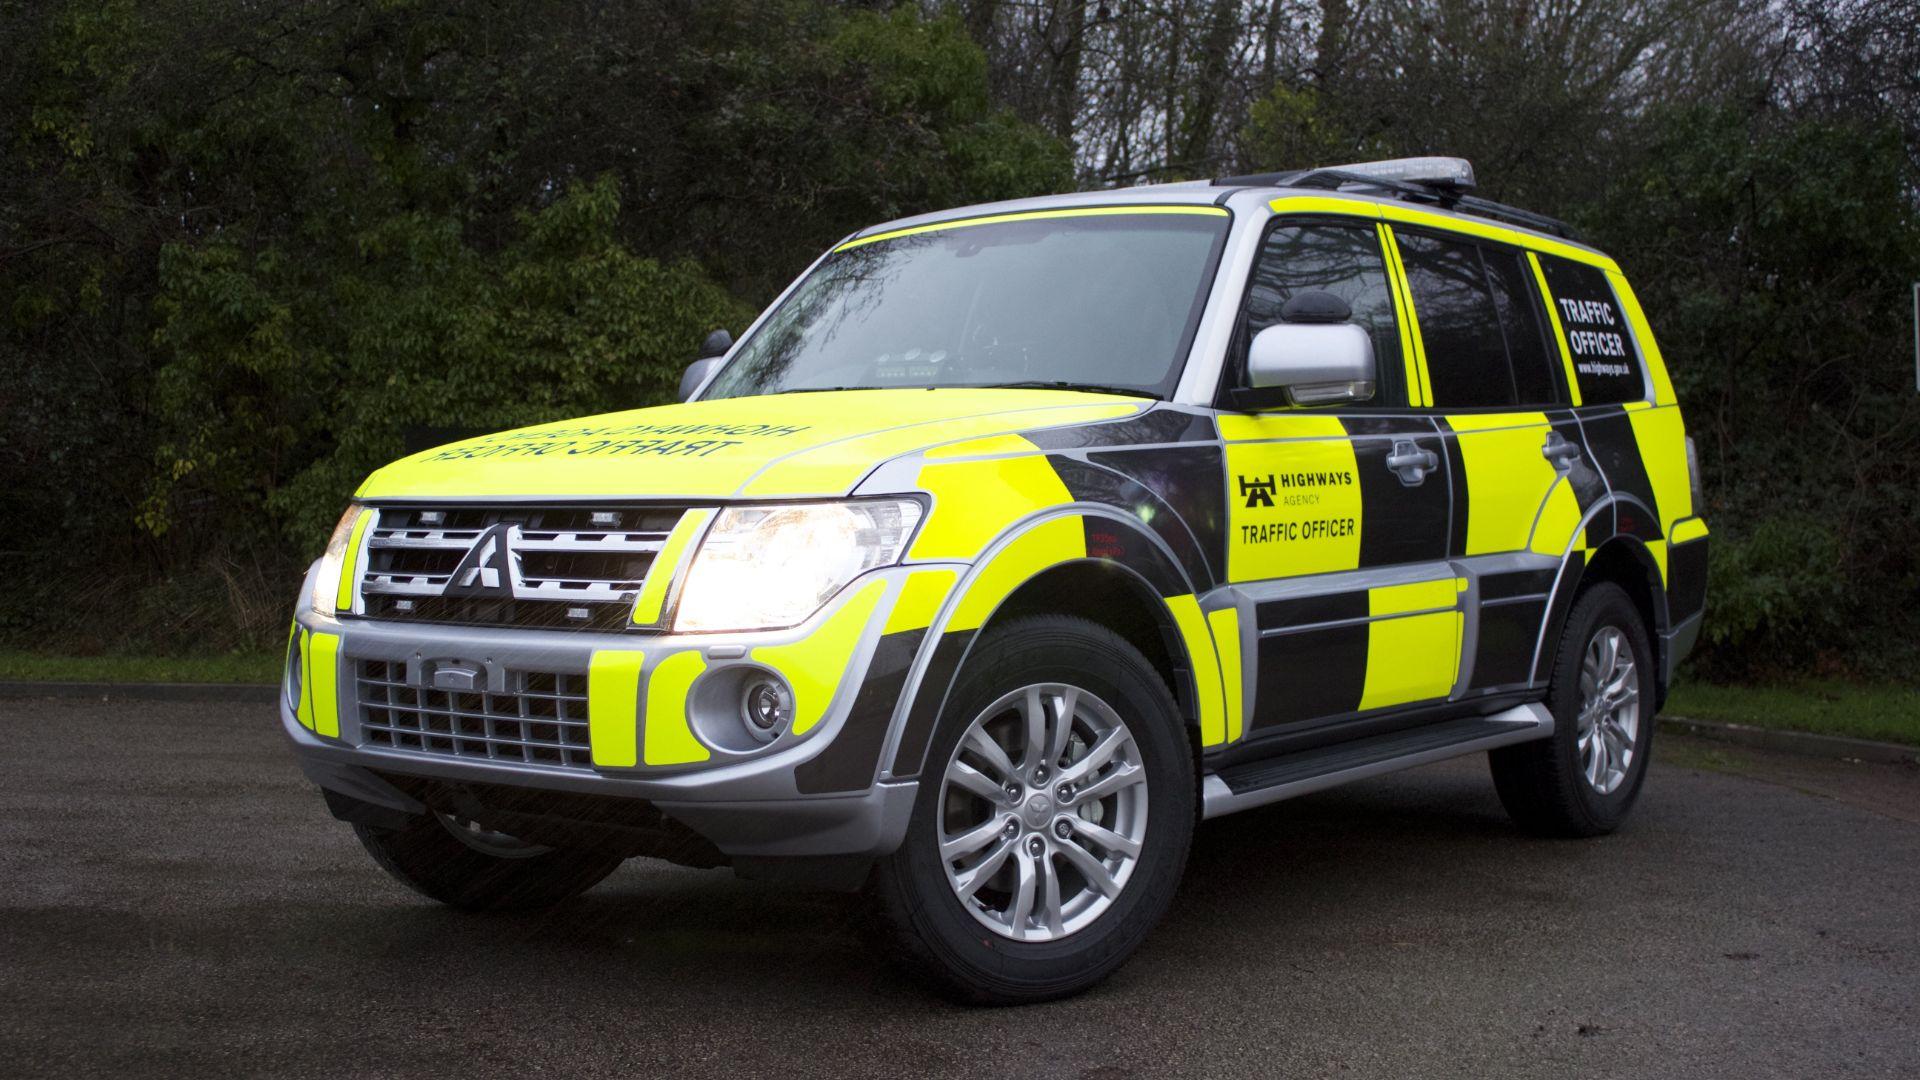 Highways Agency patrol car